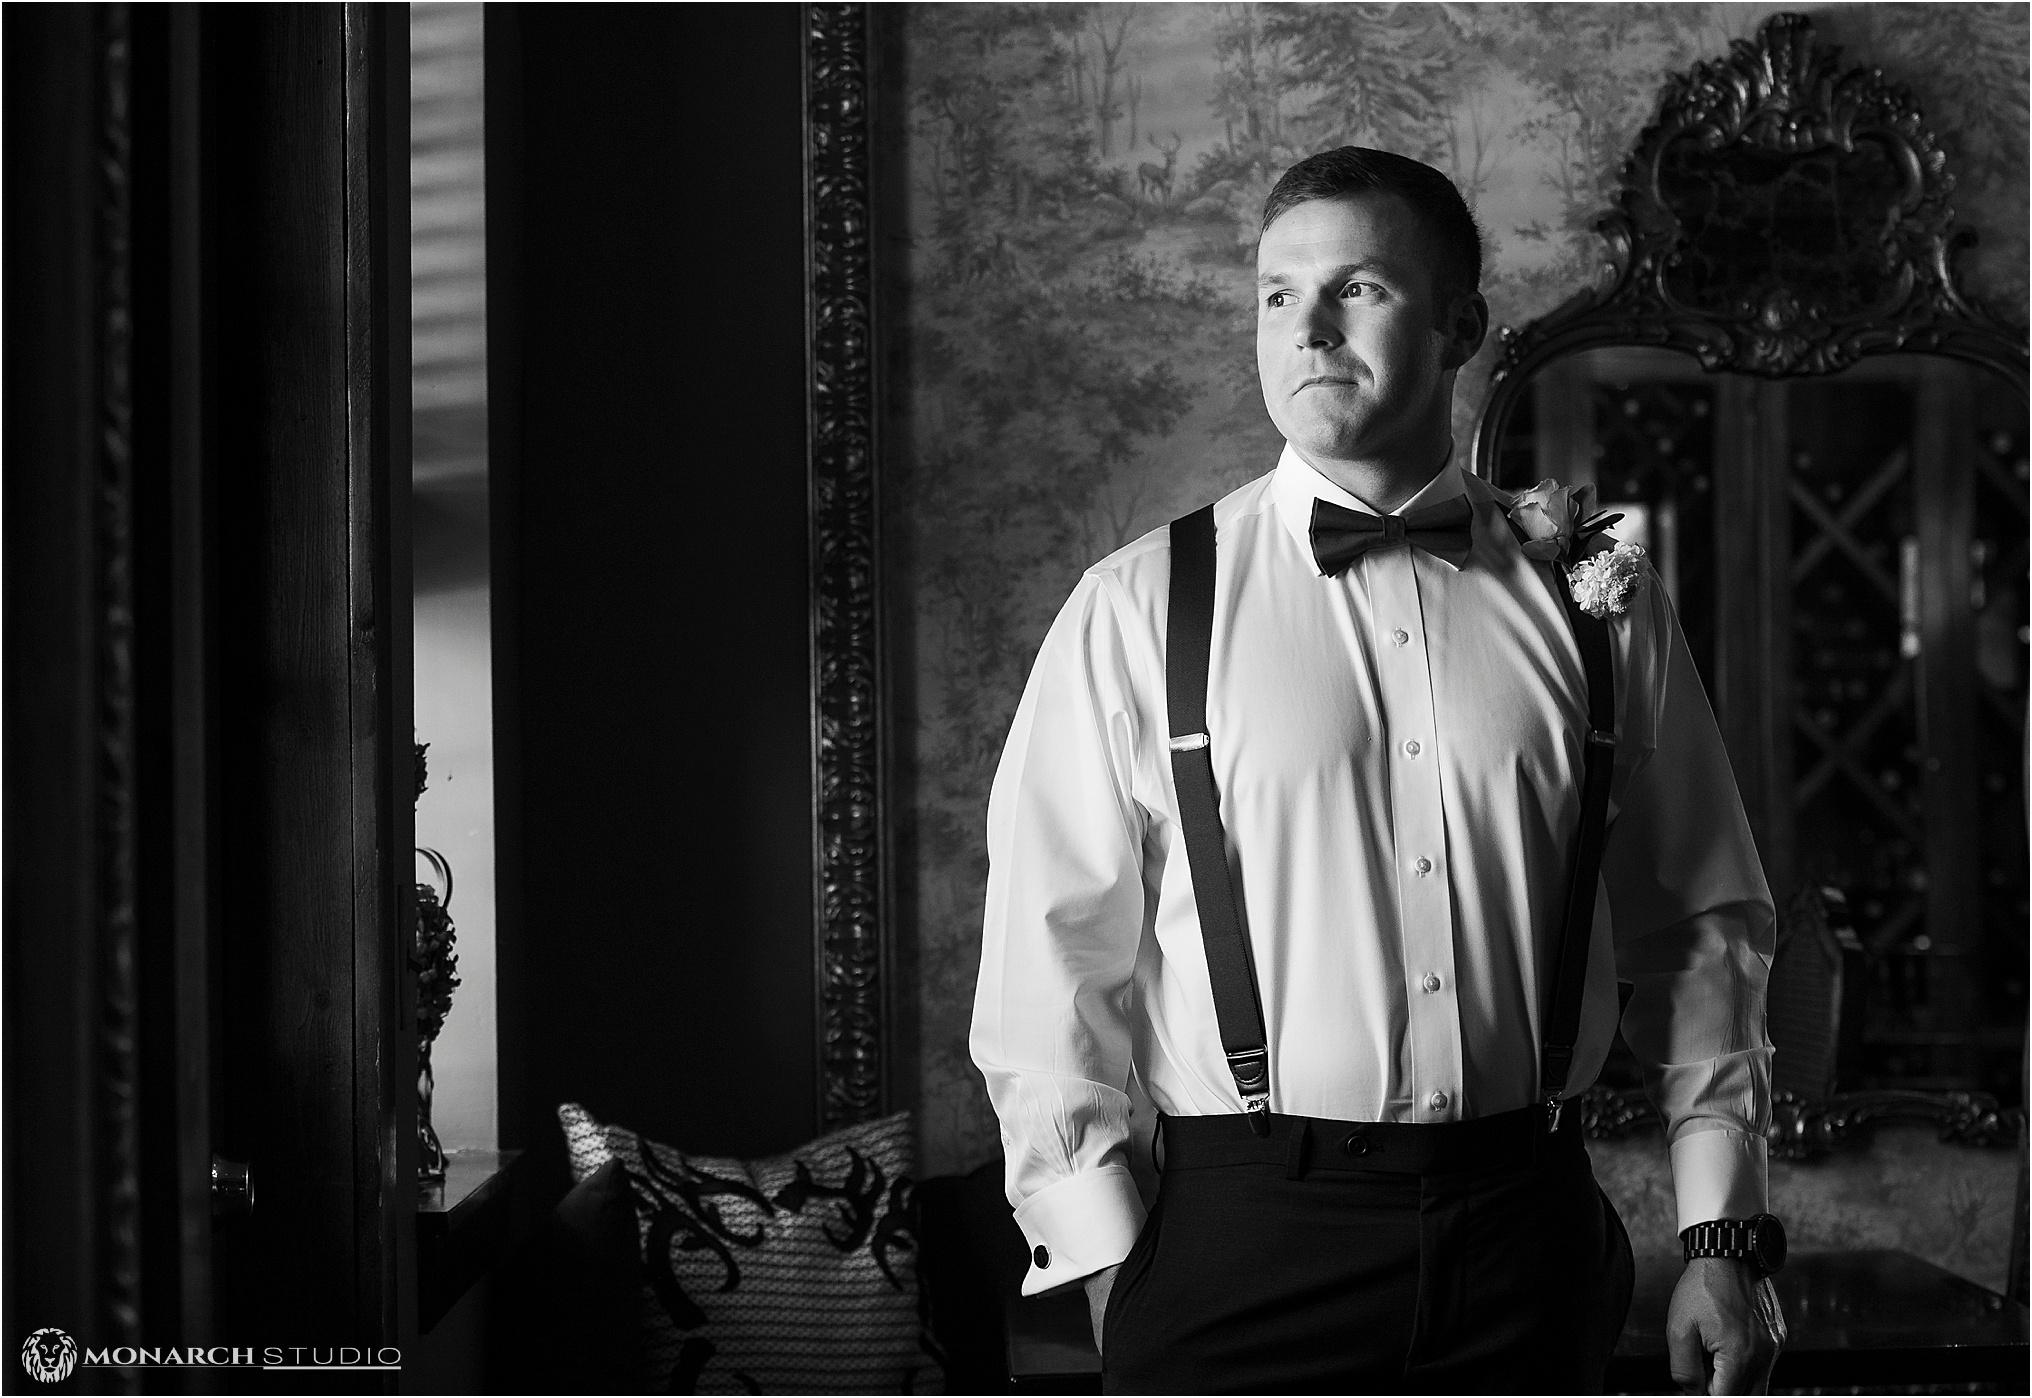 030-whiteroom-wedding-photographer-2019-05-22_0012.jpg